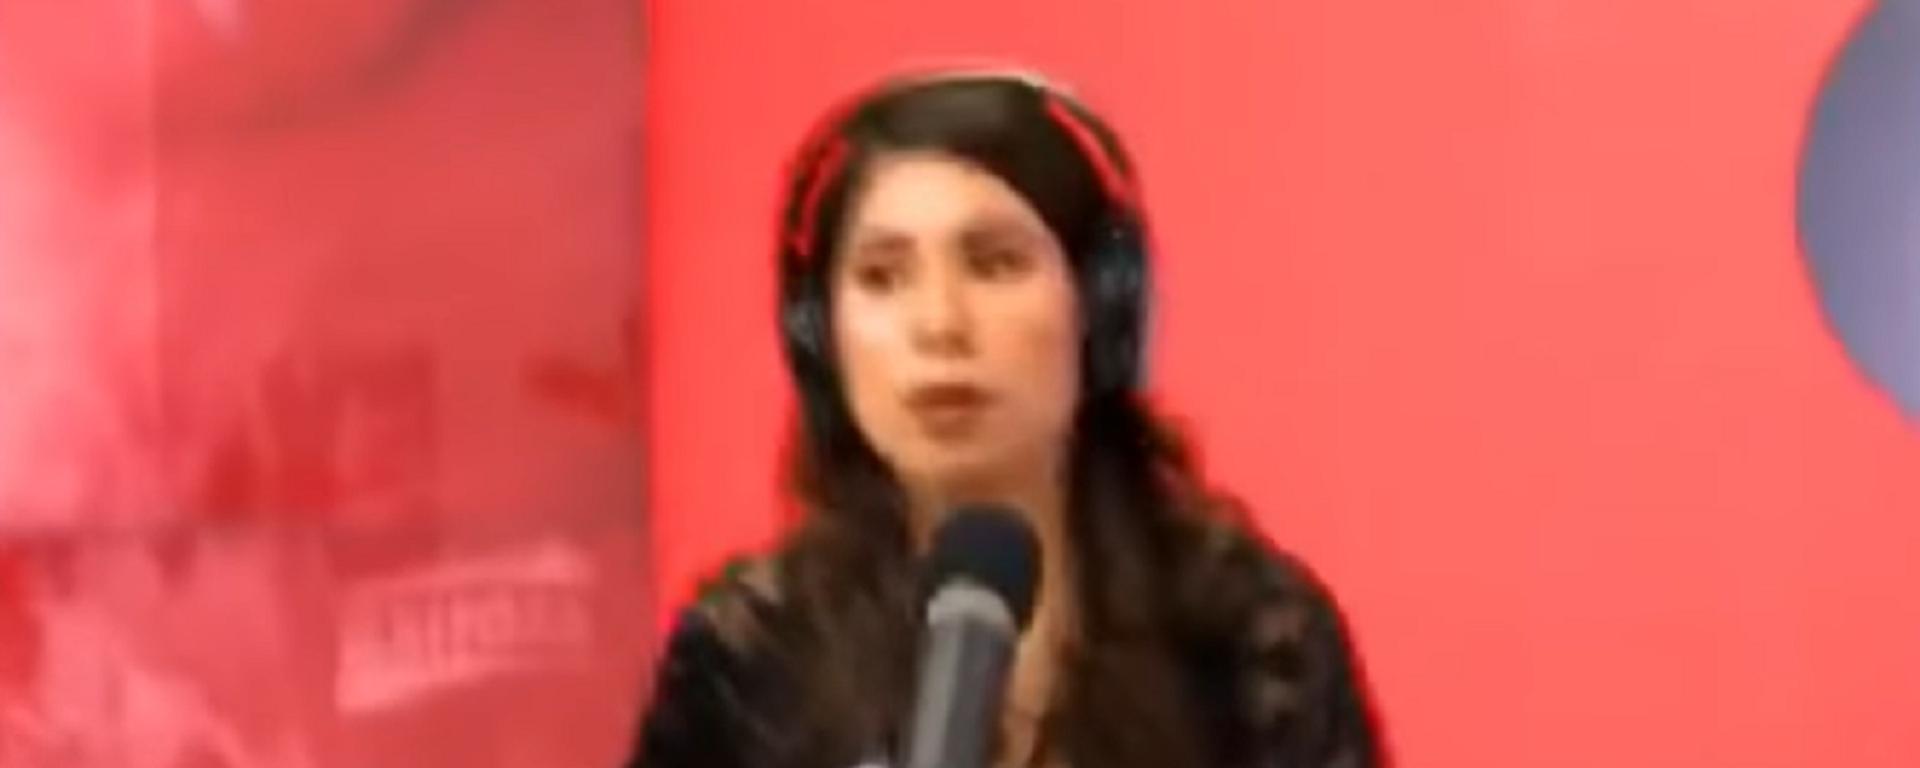 La presentadora Elvira Aybar - Sputnik Mundo, 1920, 23.06.2021